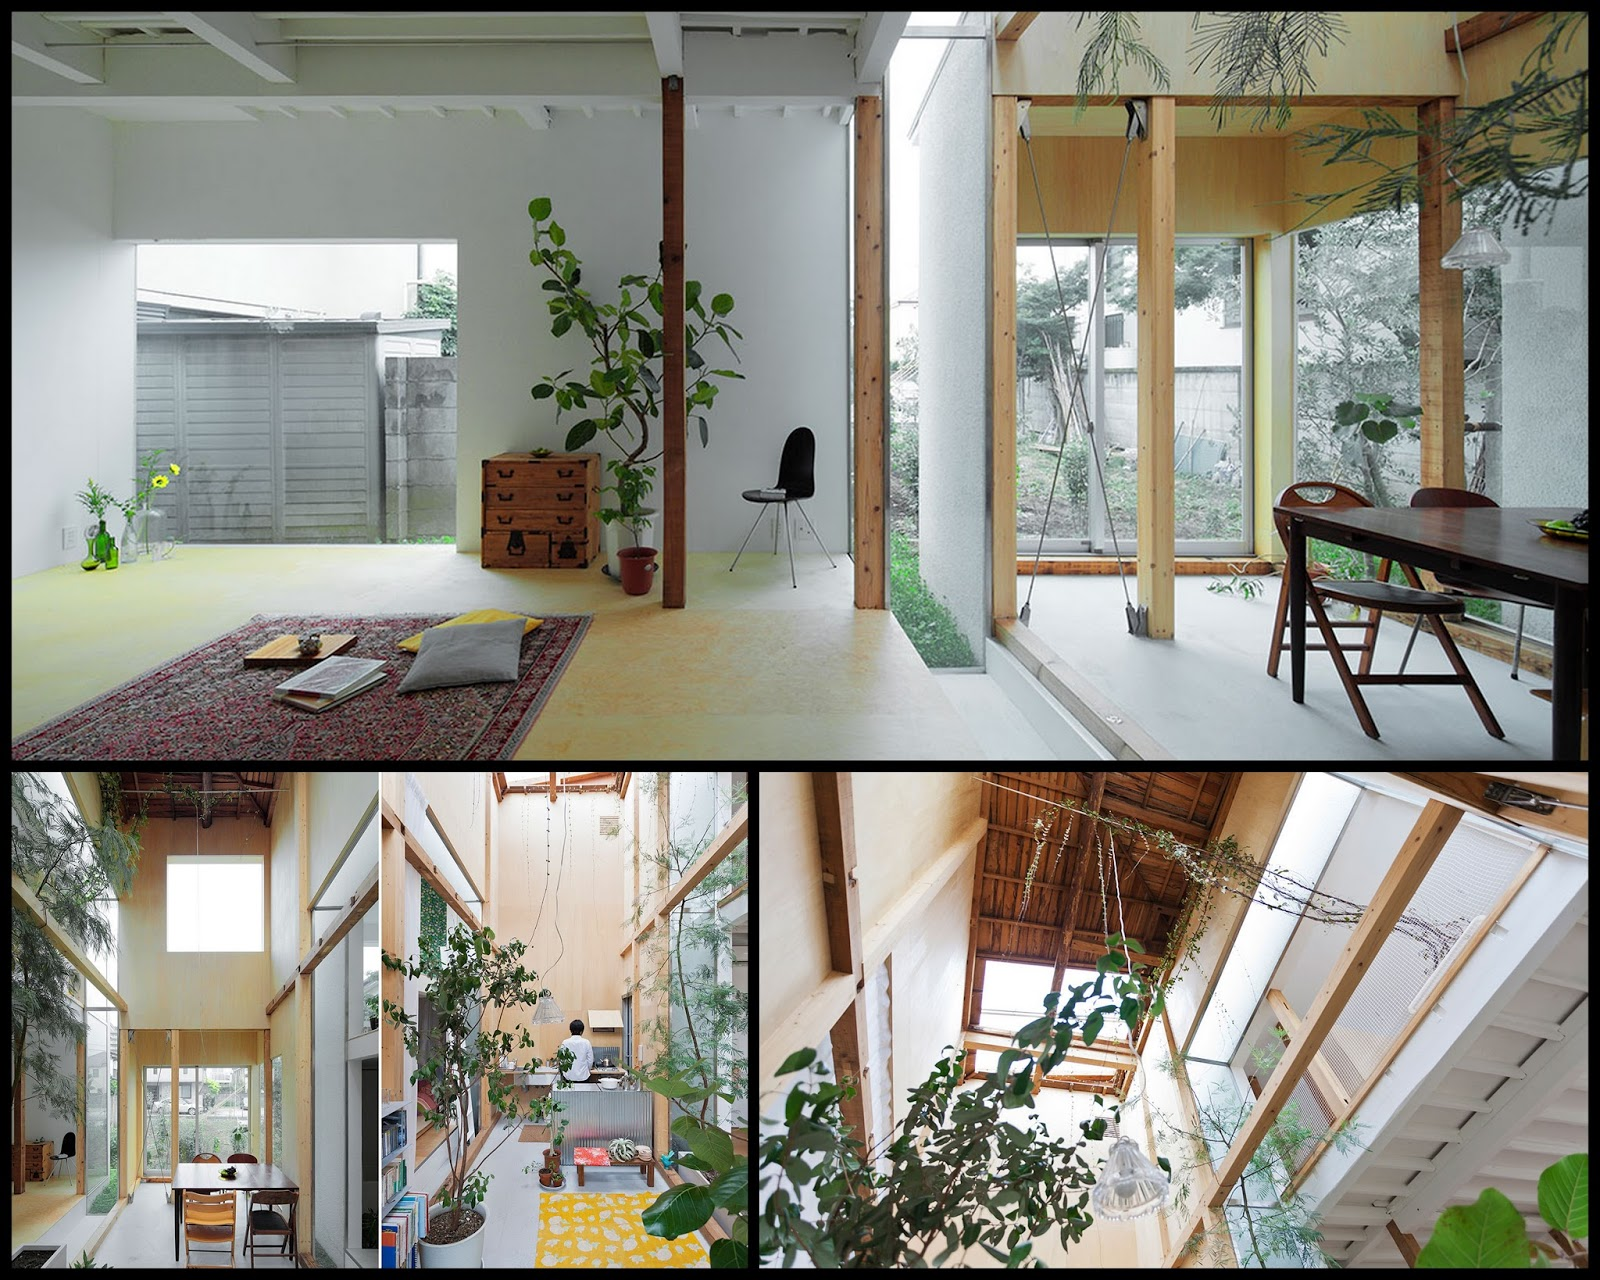 Arquitetando ideias reforma revitaliza casa japonesa - Reformas casas pequenas ...